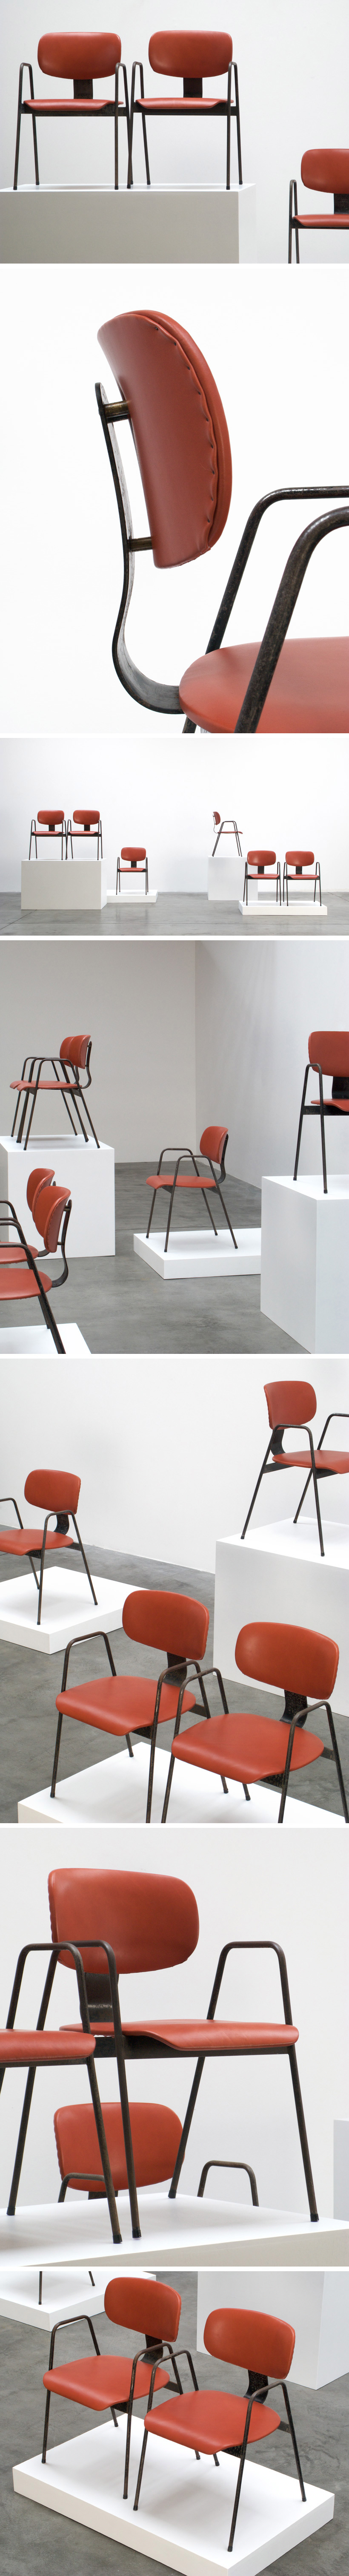 Willy Van der Meeren F2 6 Dinning chairs Large